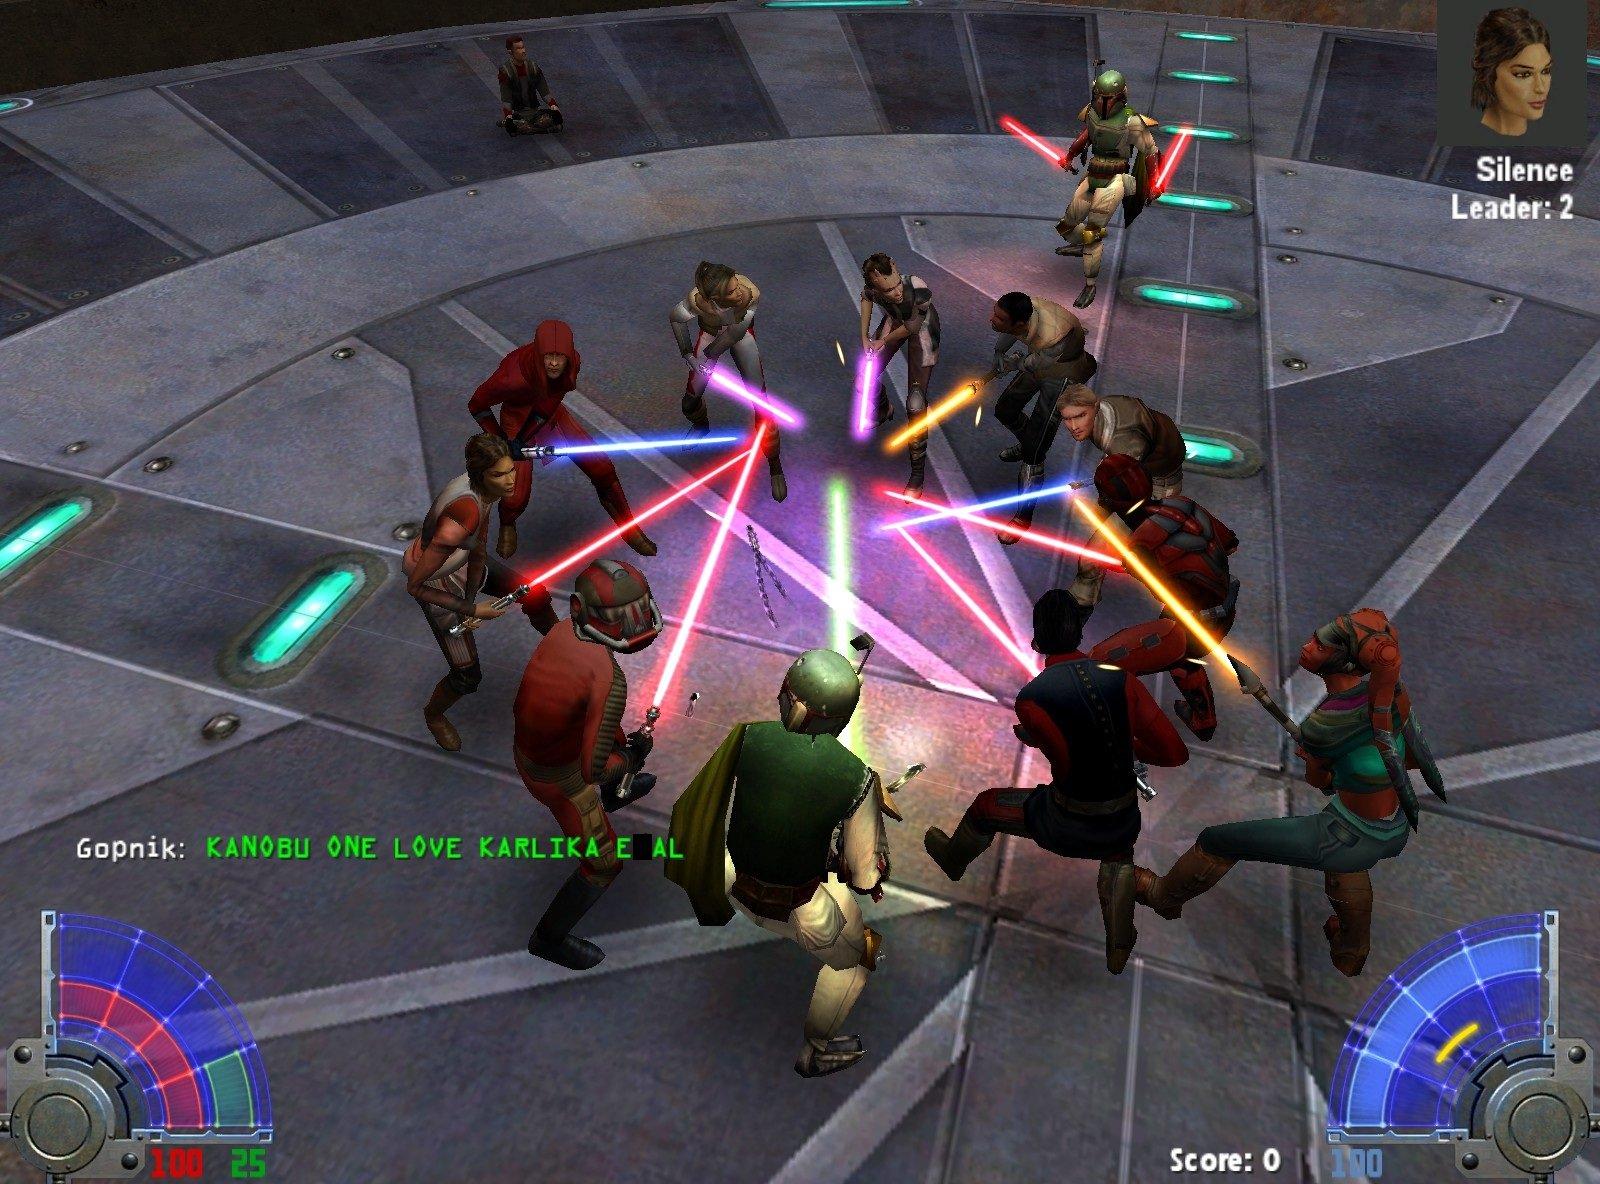 Мультиплеер Star Wars Jedi Knight: Jedi Academy - день 1 - Изображение 3